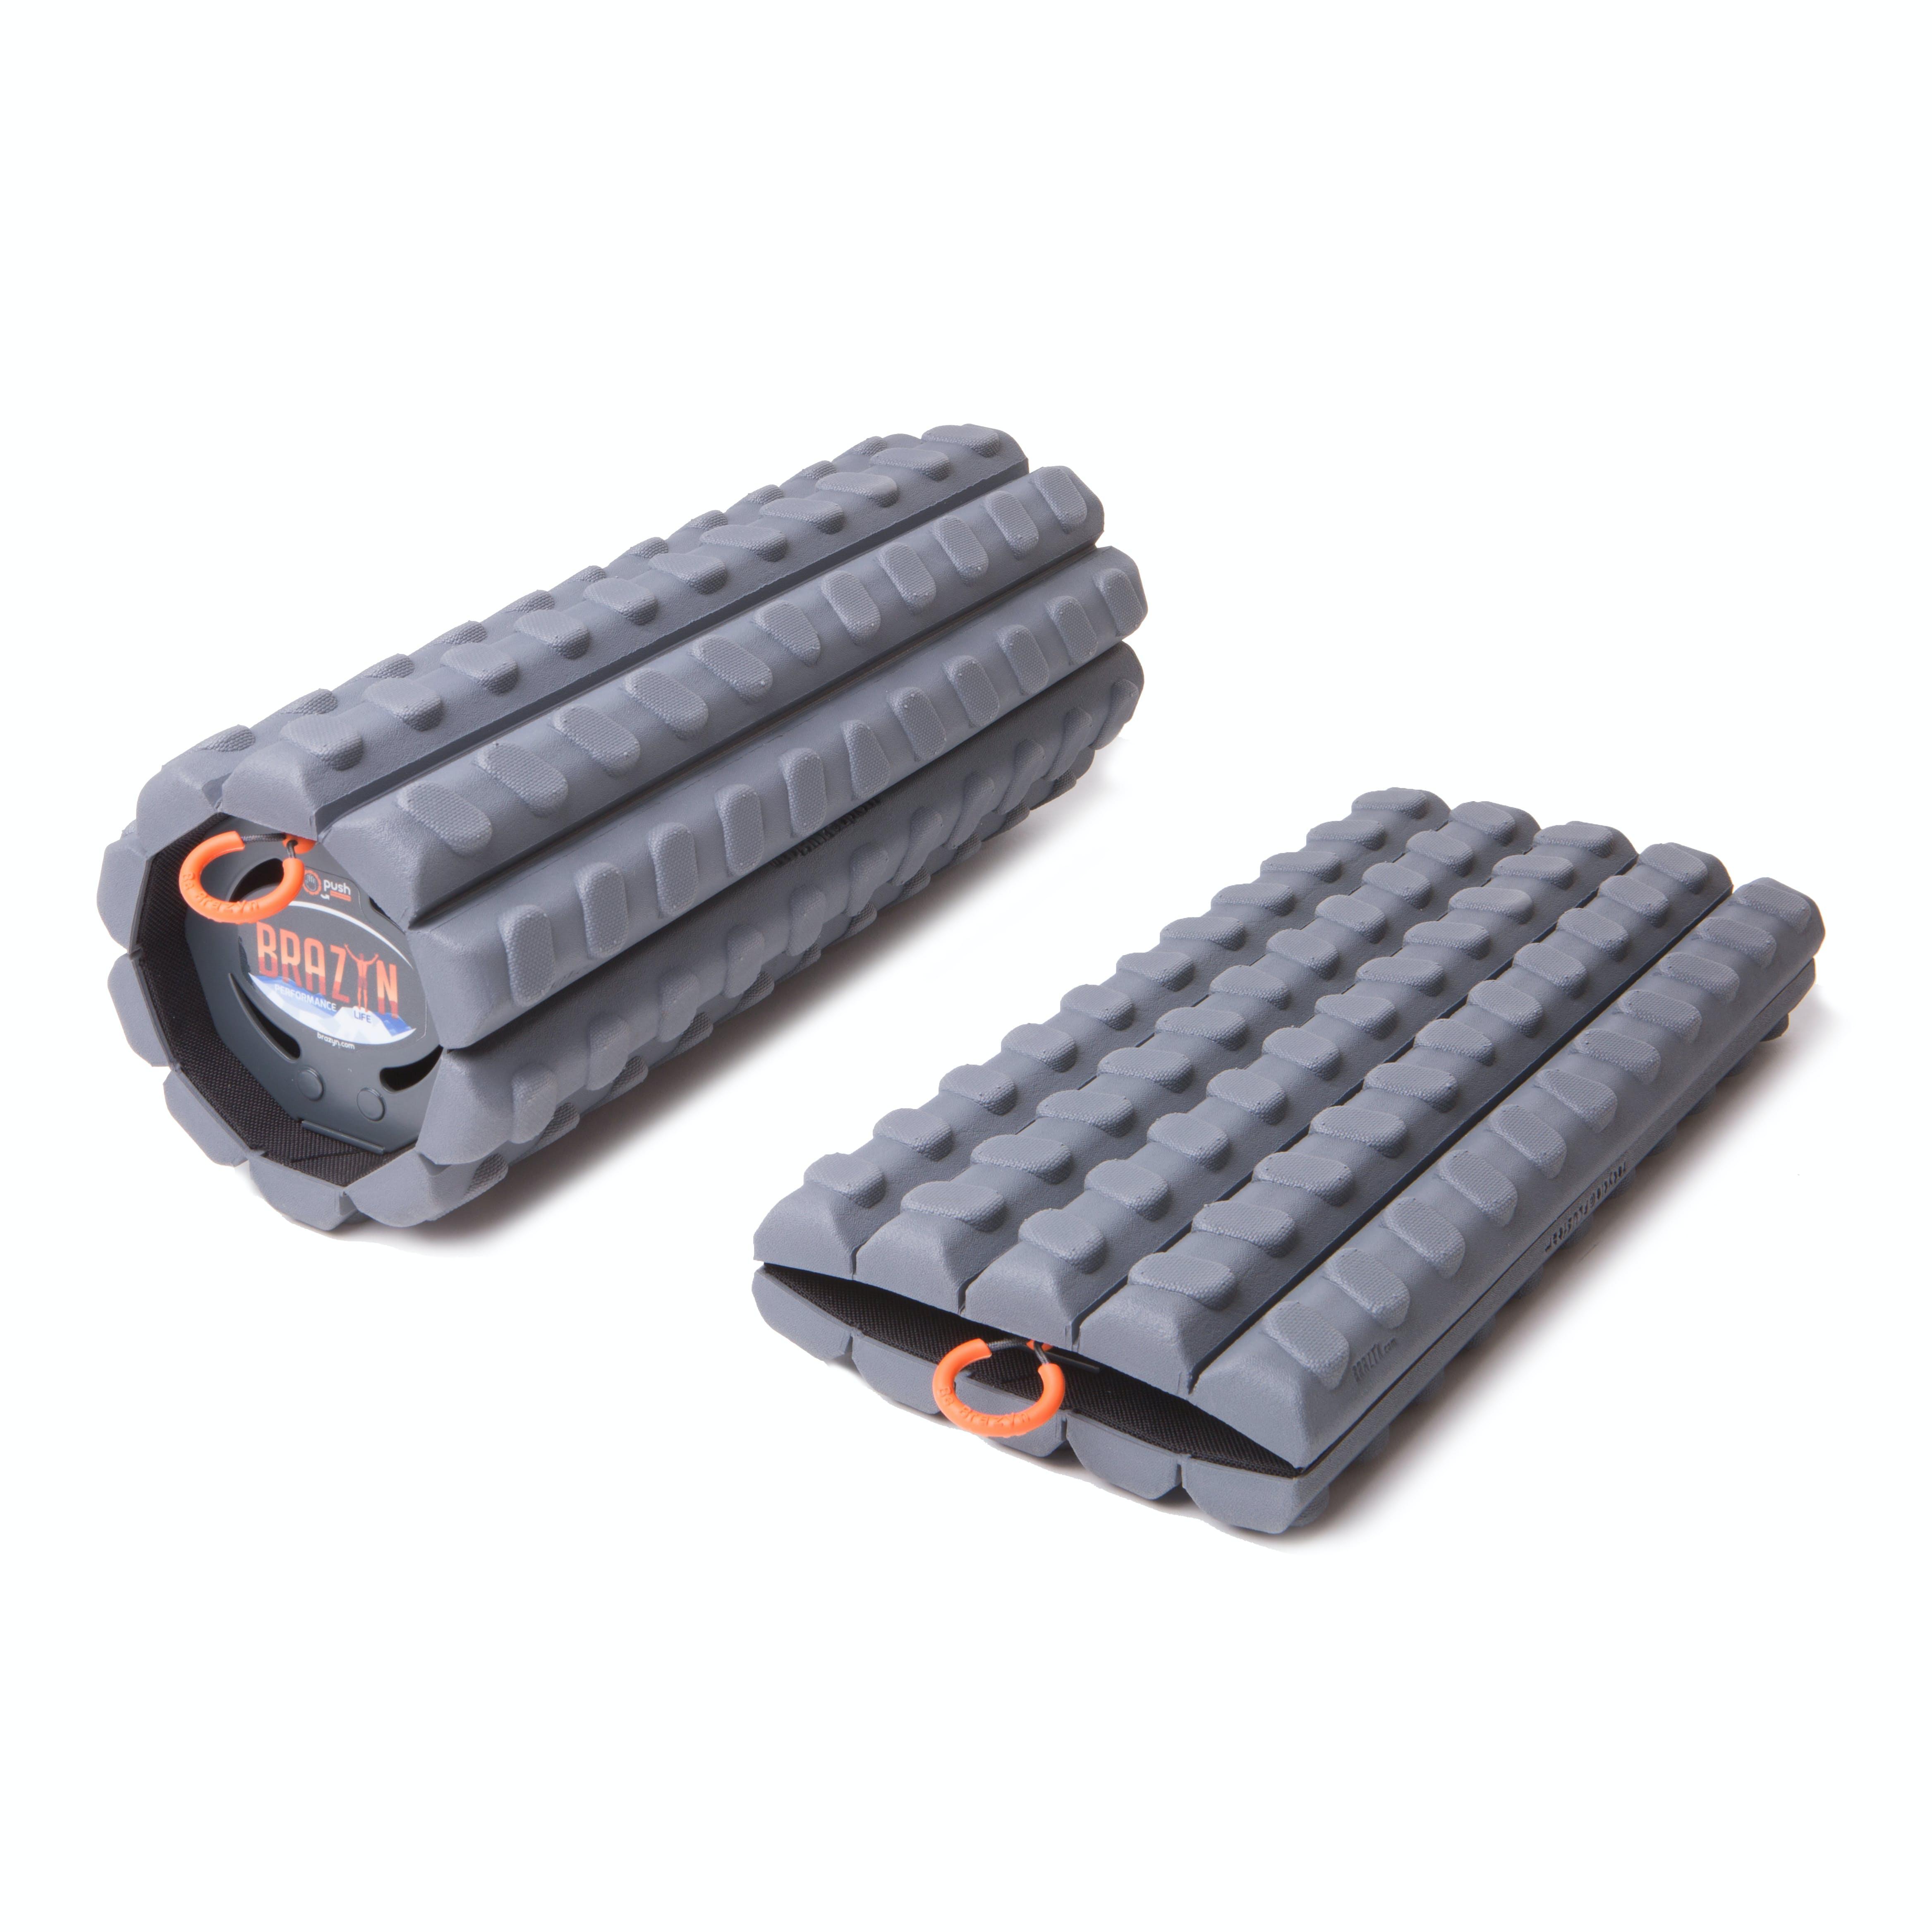 Zqrlfdinv3 brazyn the morph collapsable foam roller 0 original